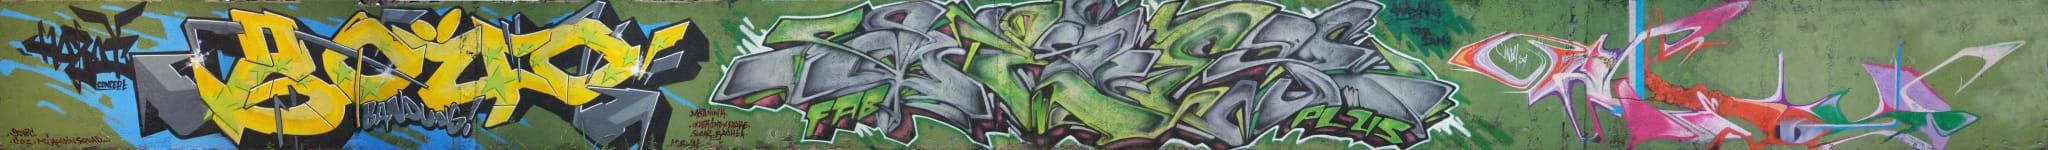 Artwork By 60 in Bandung